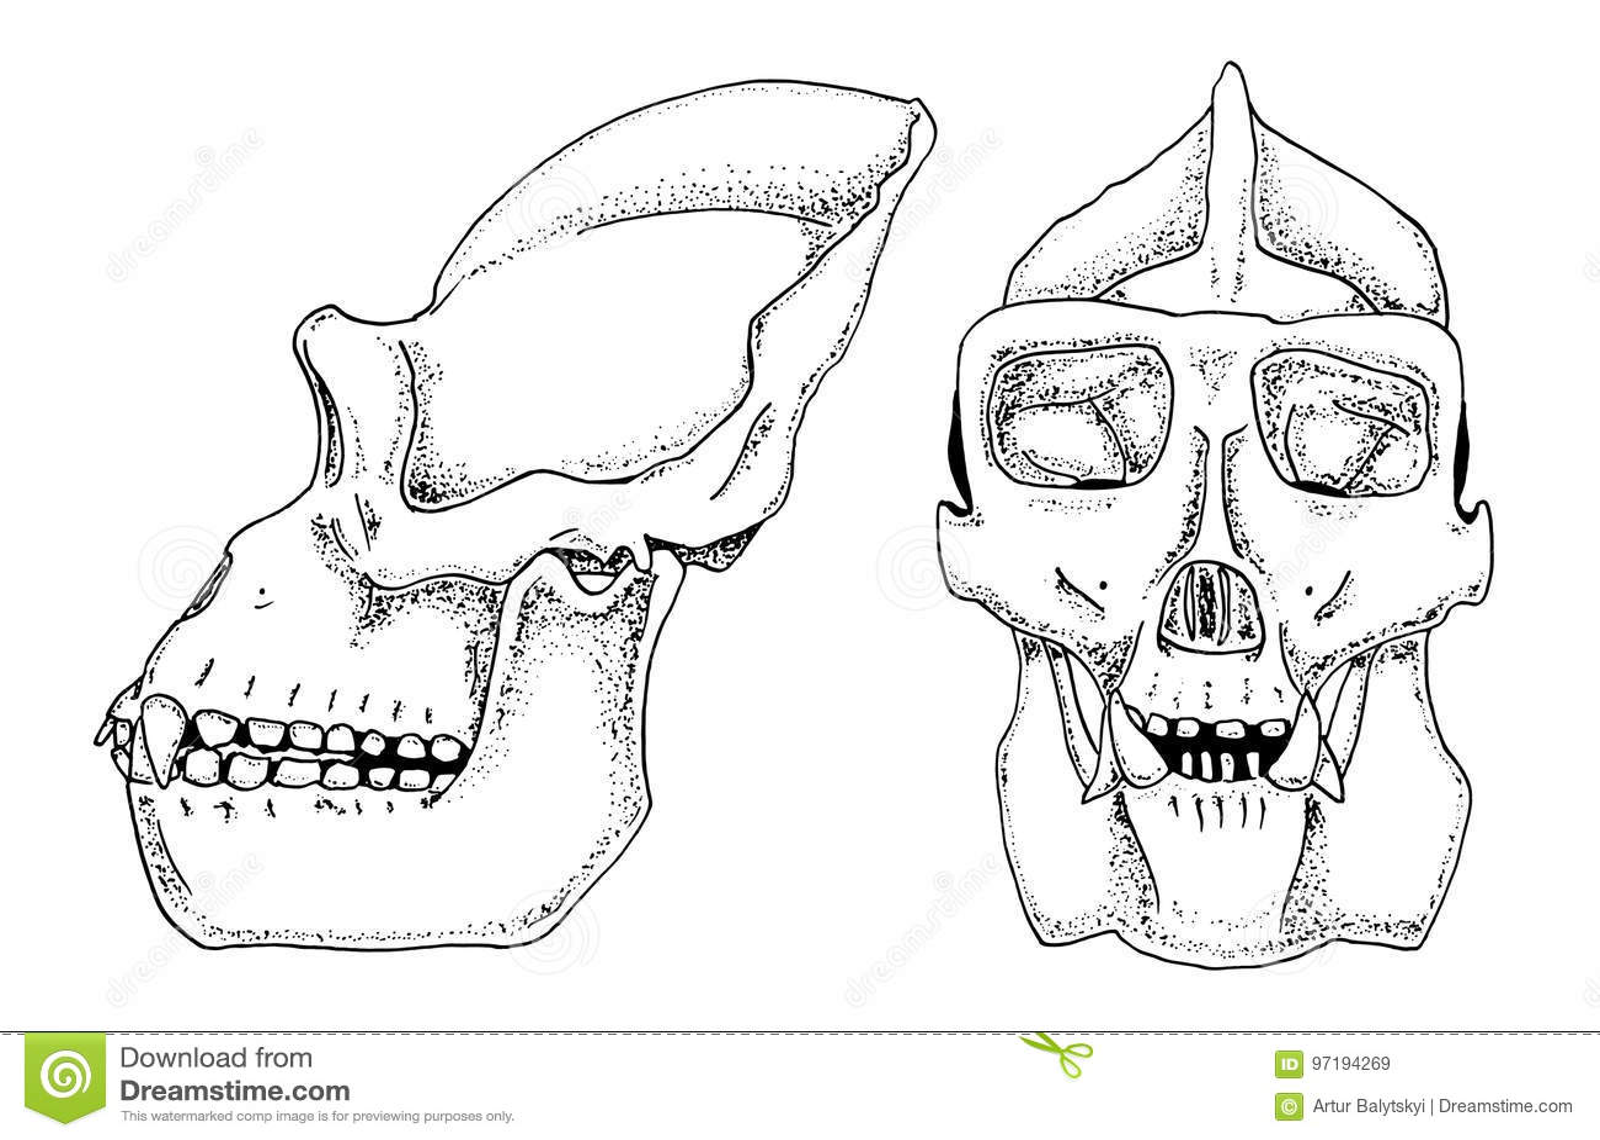 Gorilla Biology, Anatomy Illustration. Engraved Hand Drawn In Old ...